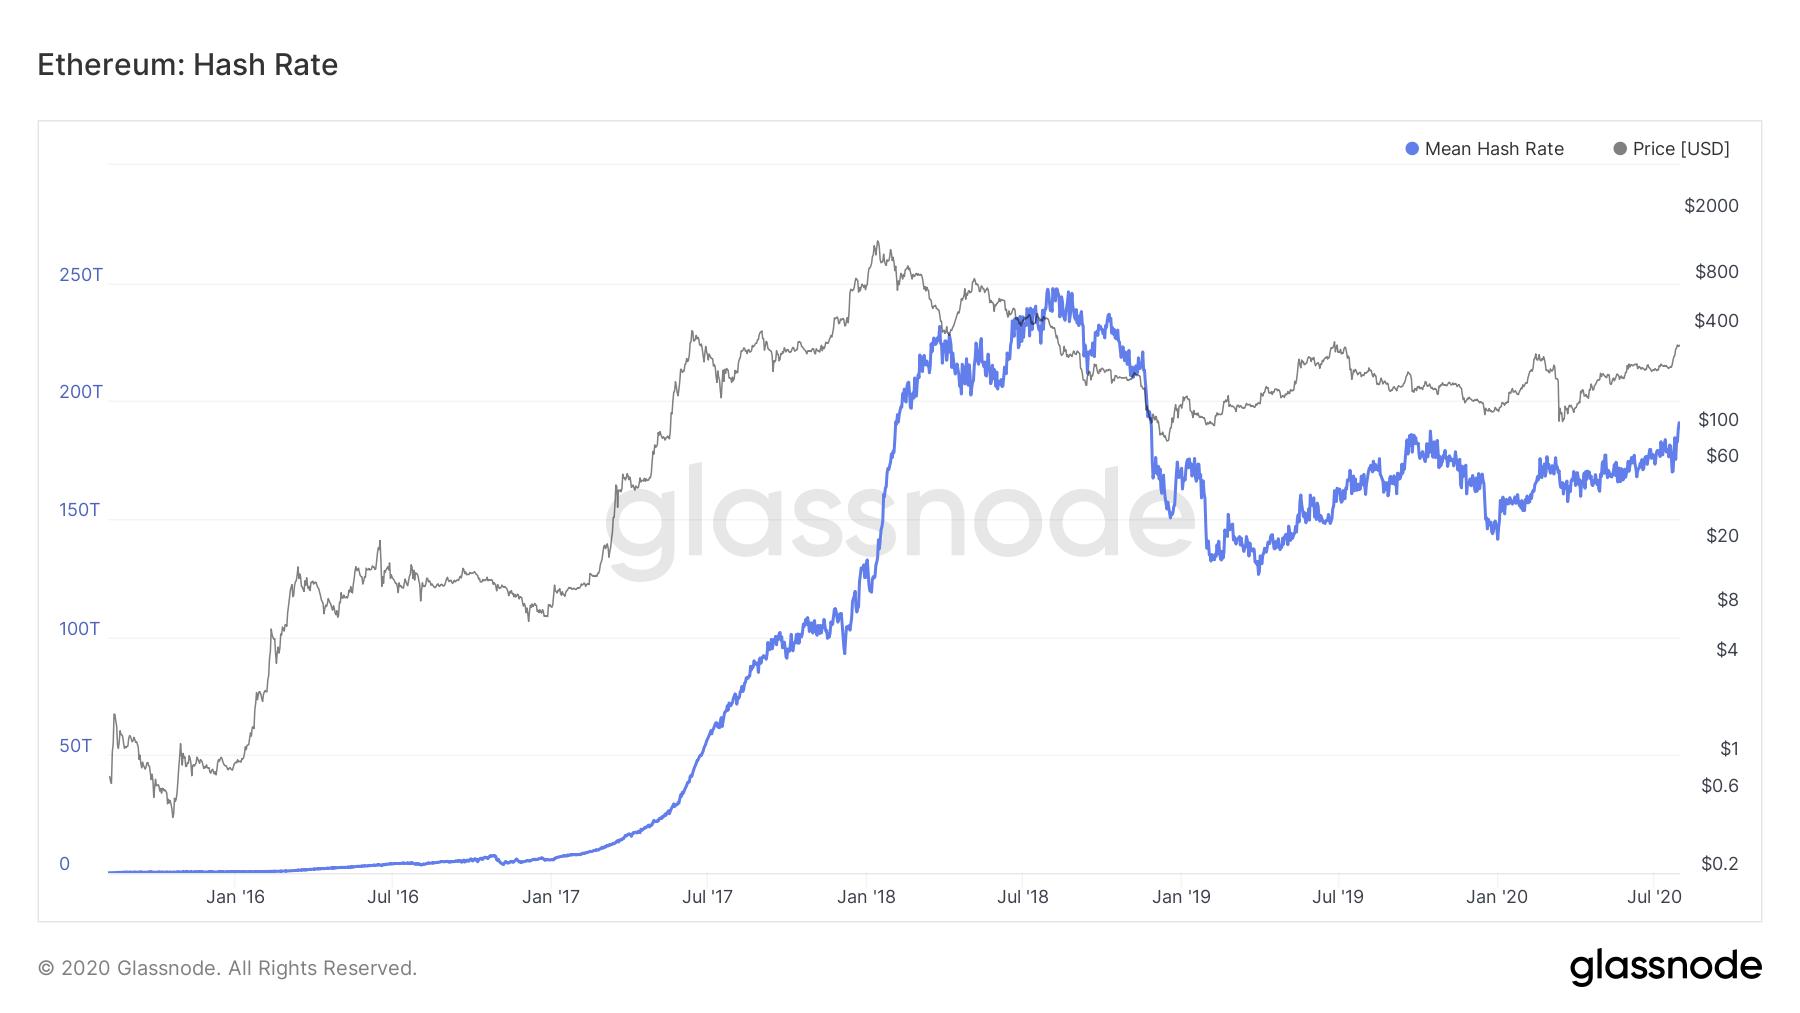 Ethereum hash rate. Source: Glassnode